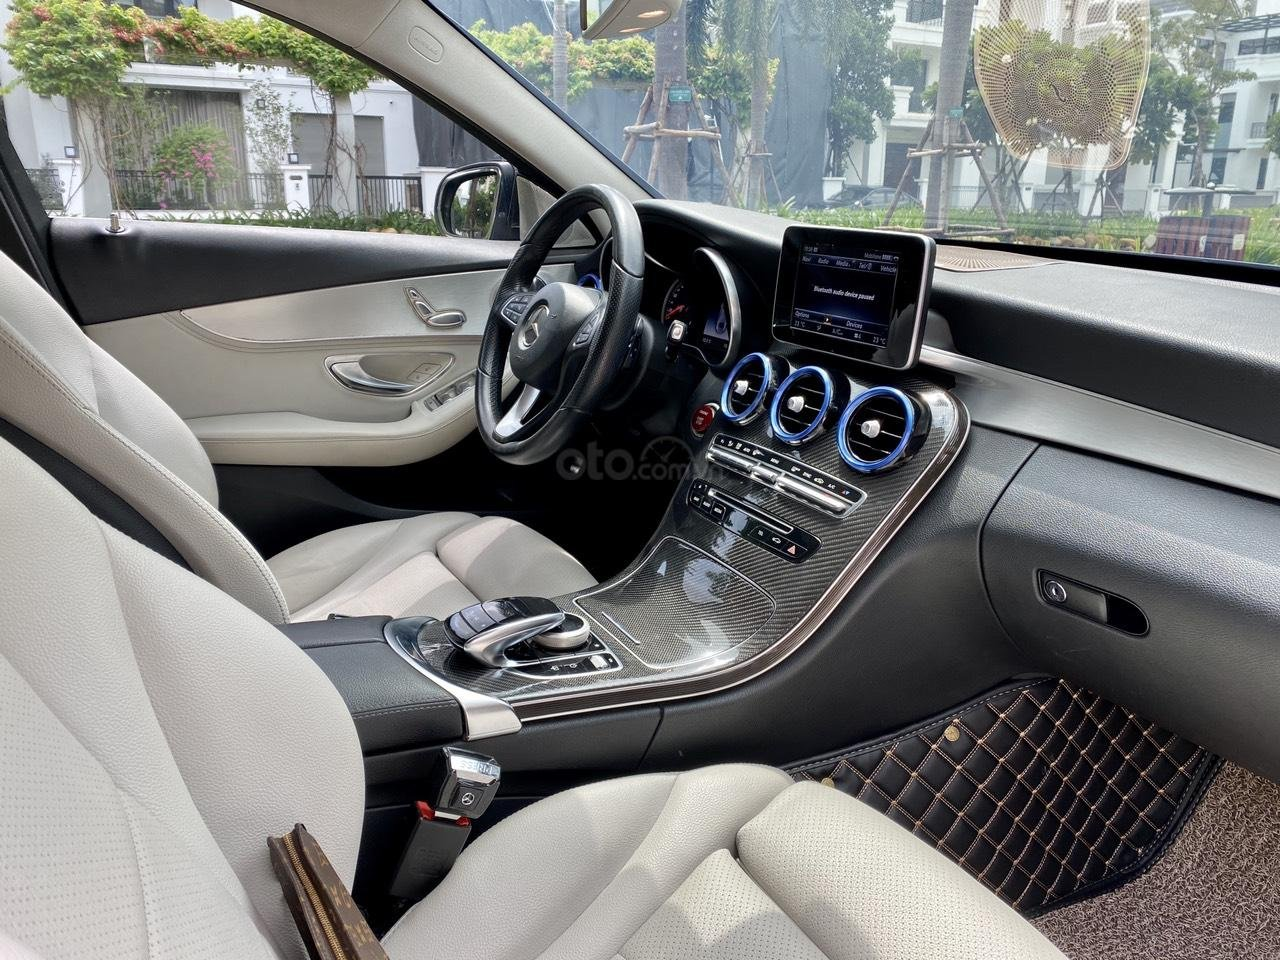 Mercedes C200 sx 2015, đk 2016, màu đen, nội thất kem (15)